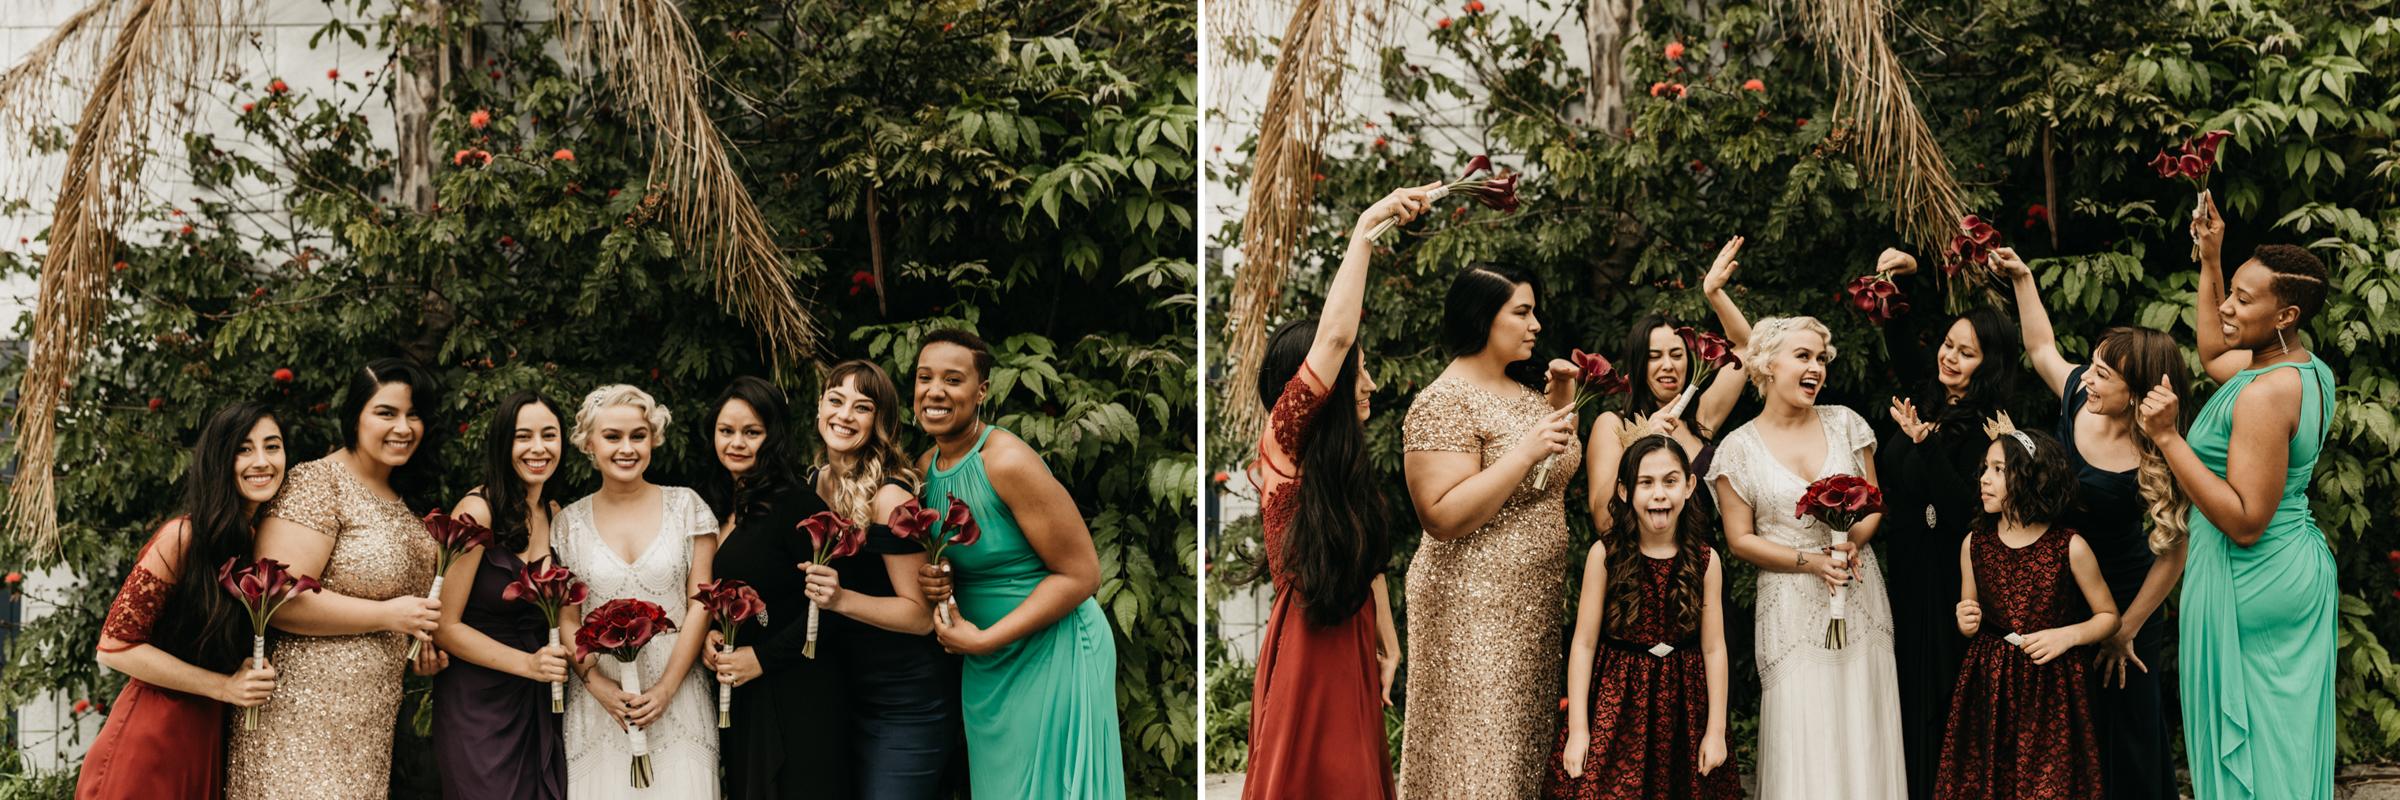 ©Isaiah + Taylor Photography - Studio 11 Wedding, Los Angeles Wedding Photographer-36.jpg